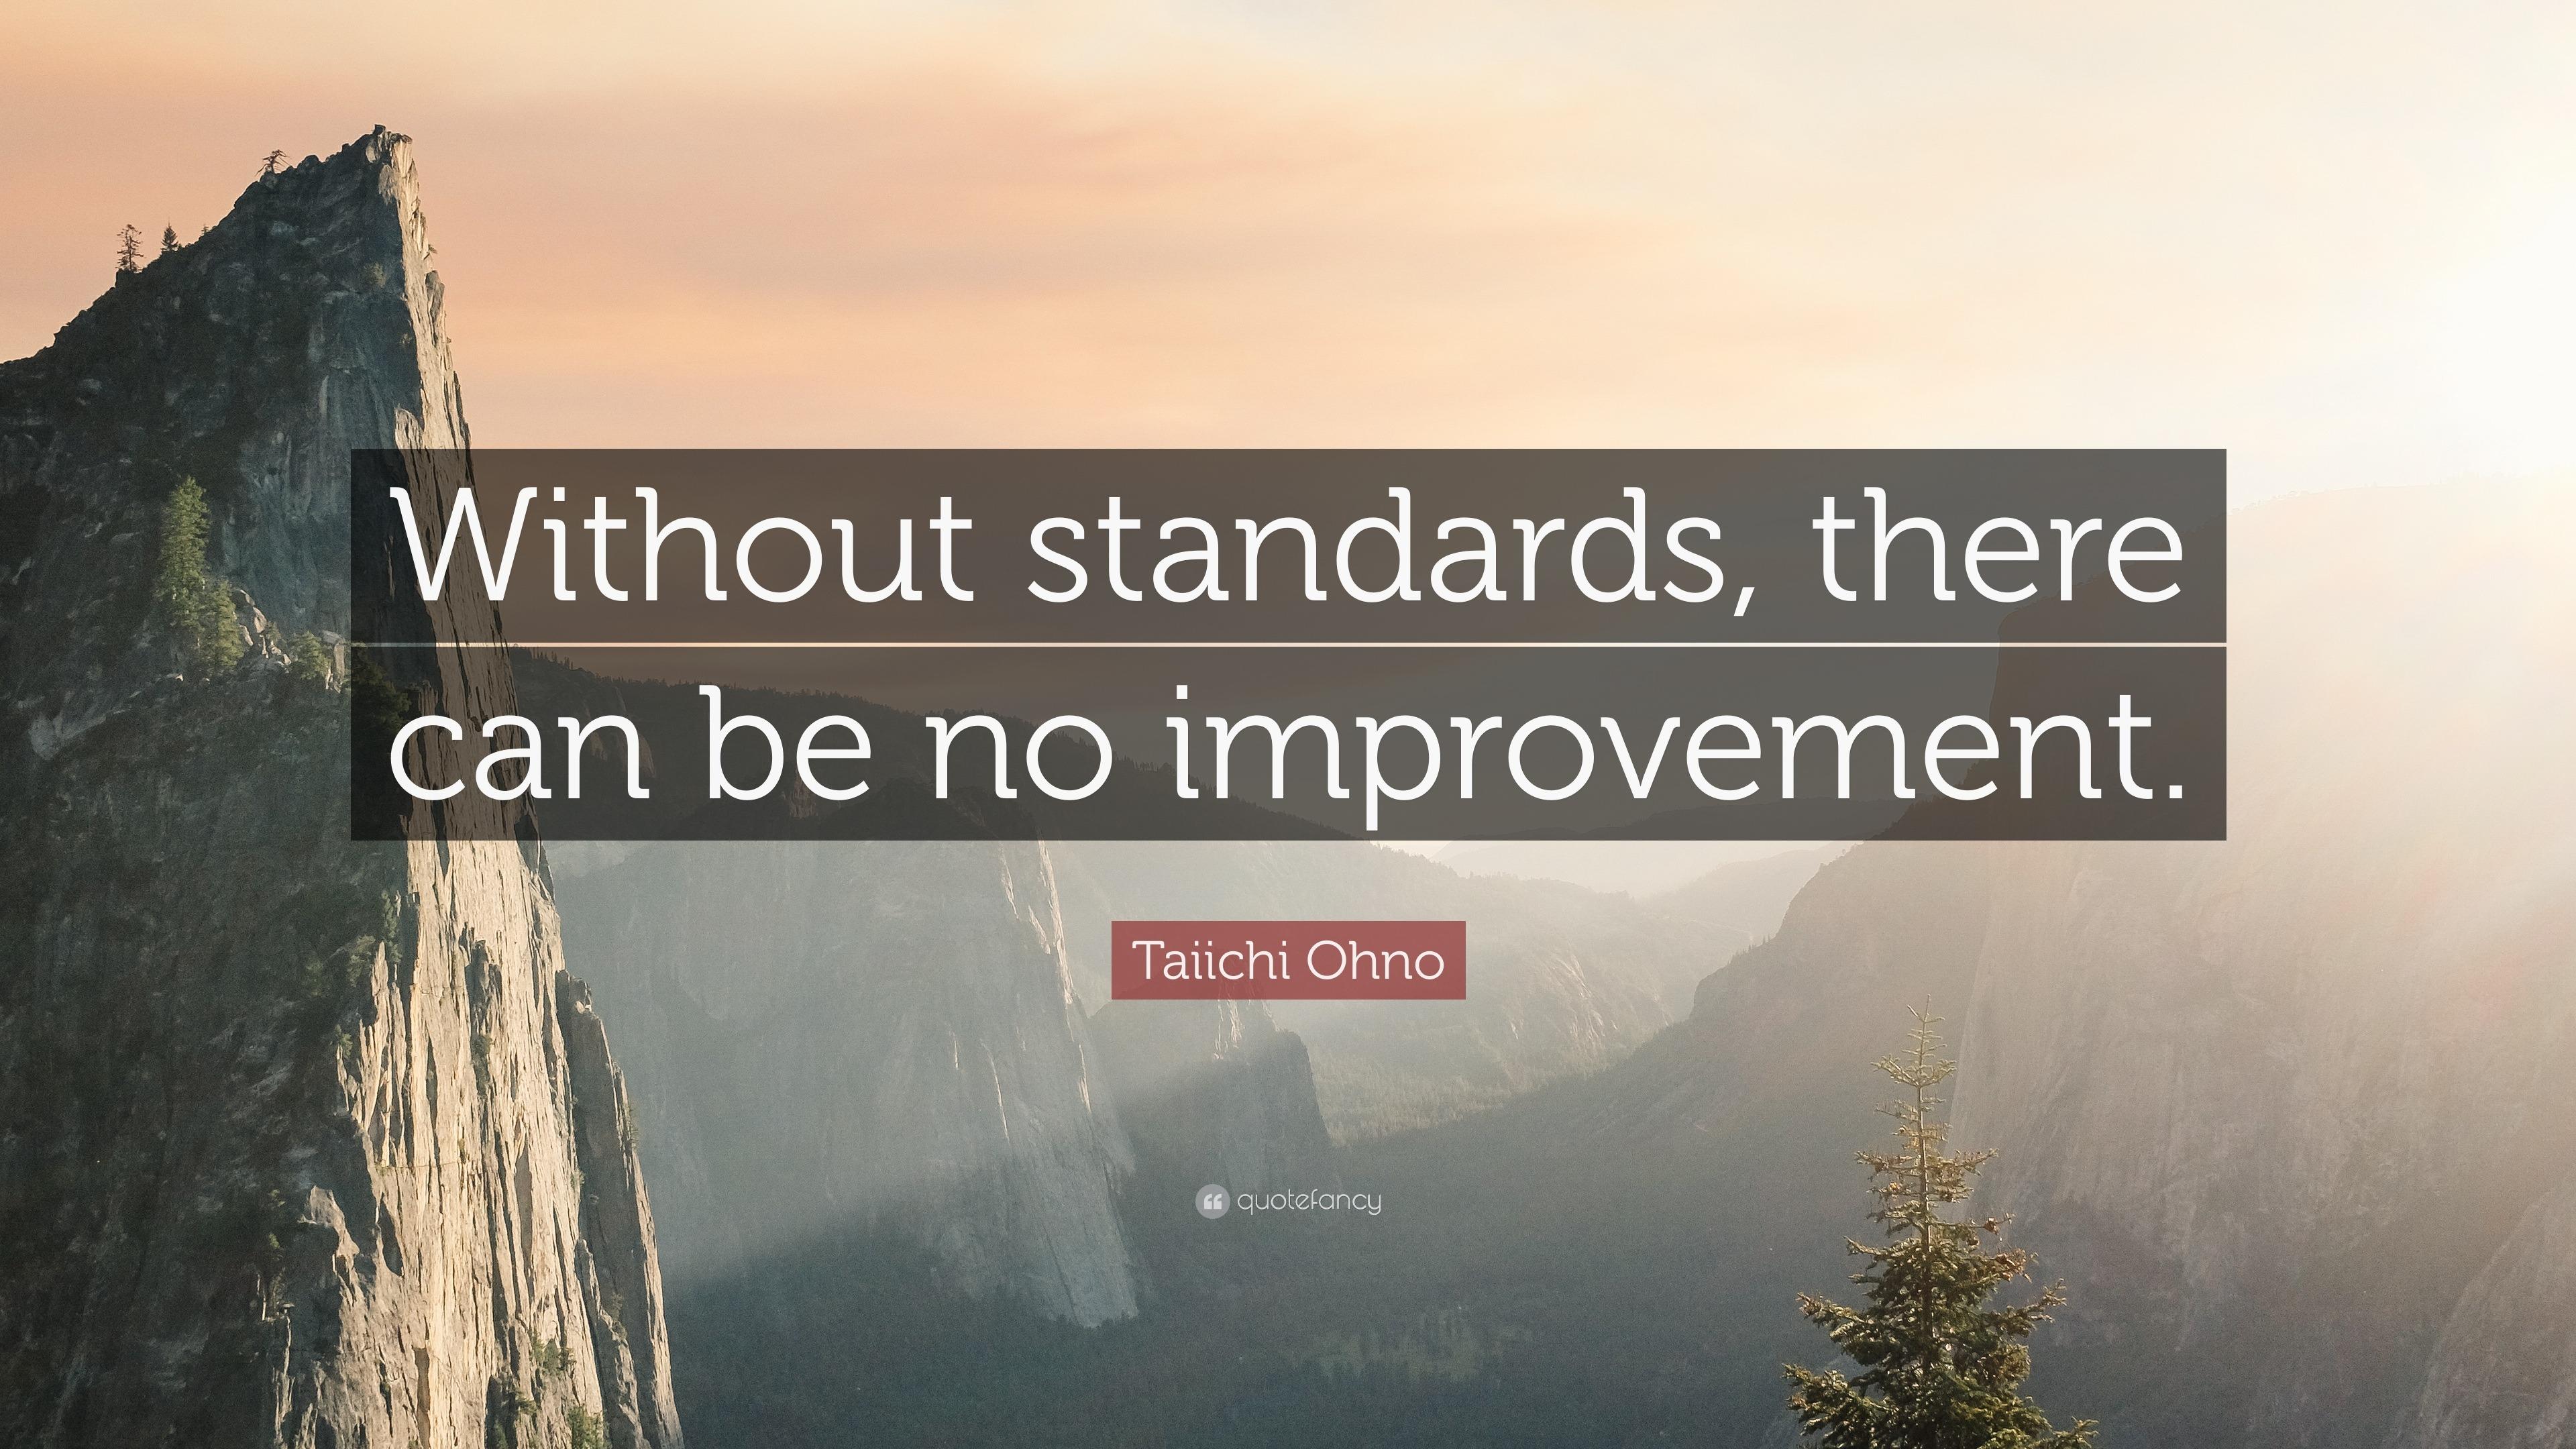 Taiichi Ohno Quotes (20 Wallpapers)